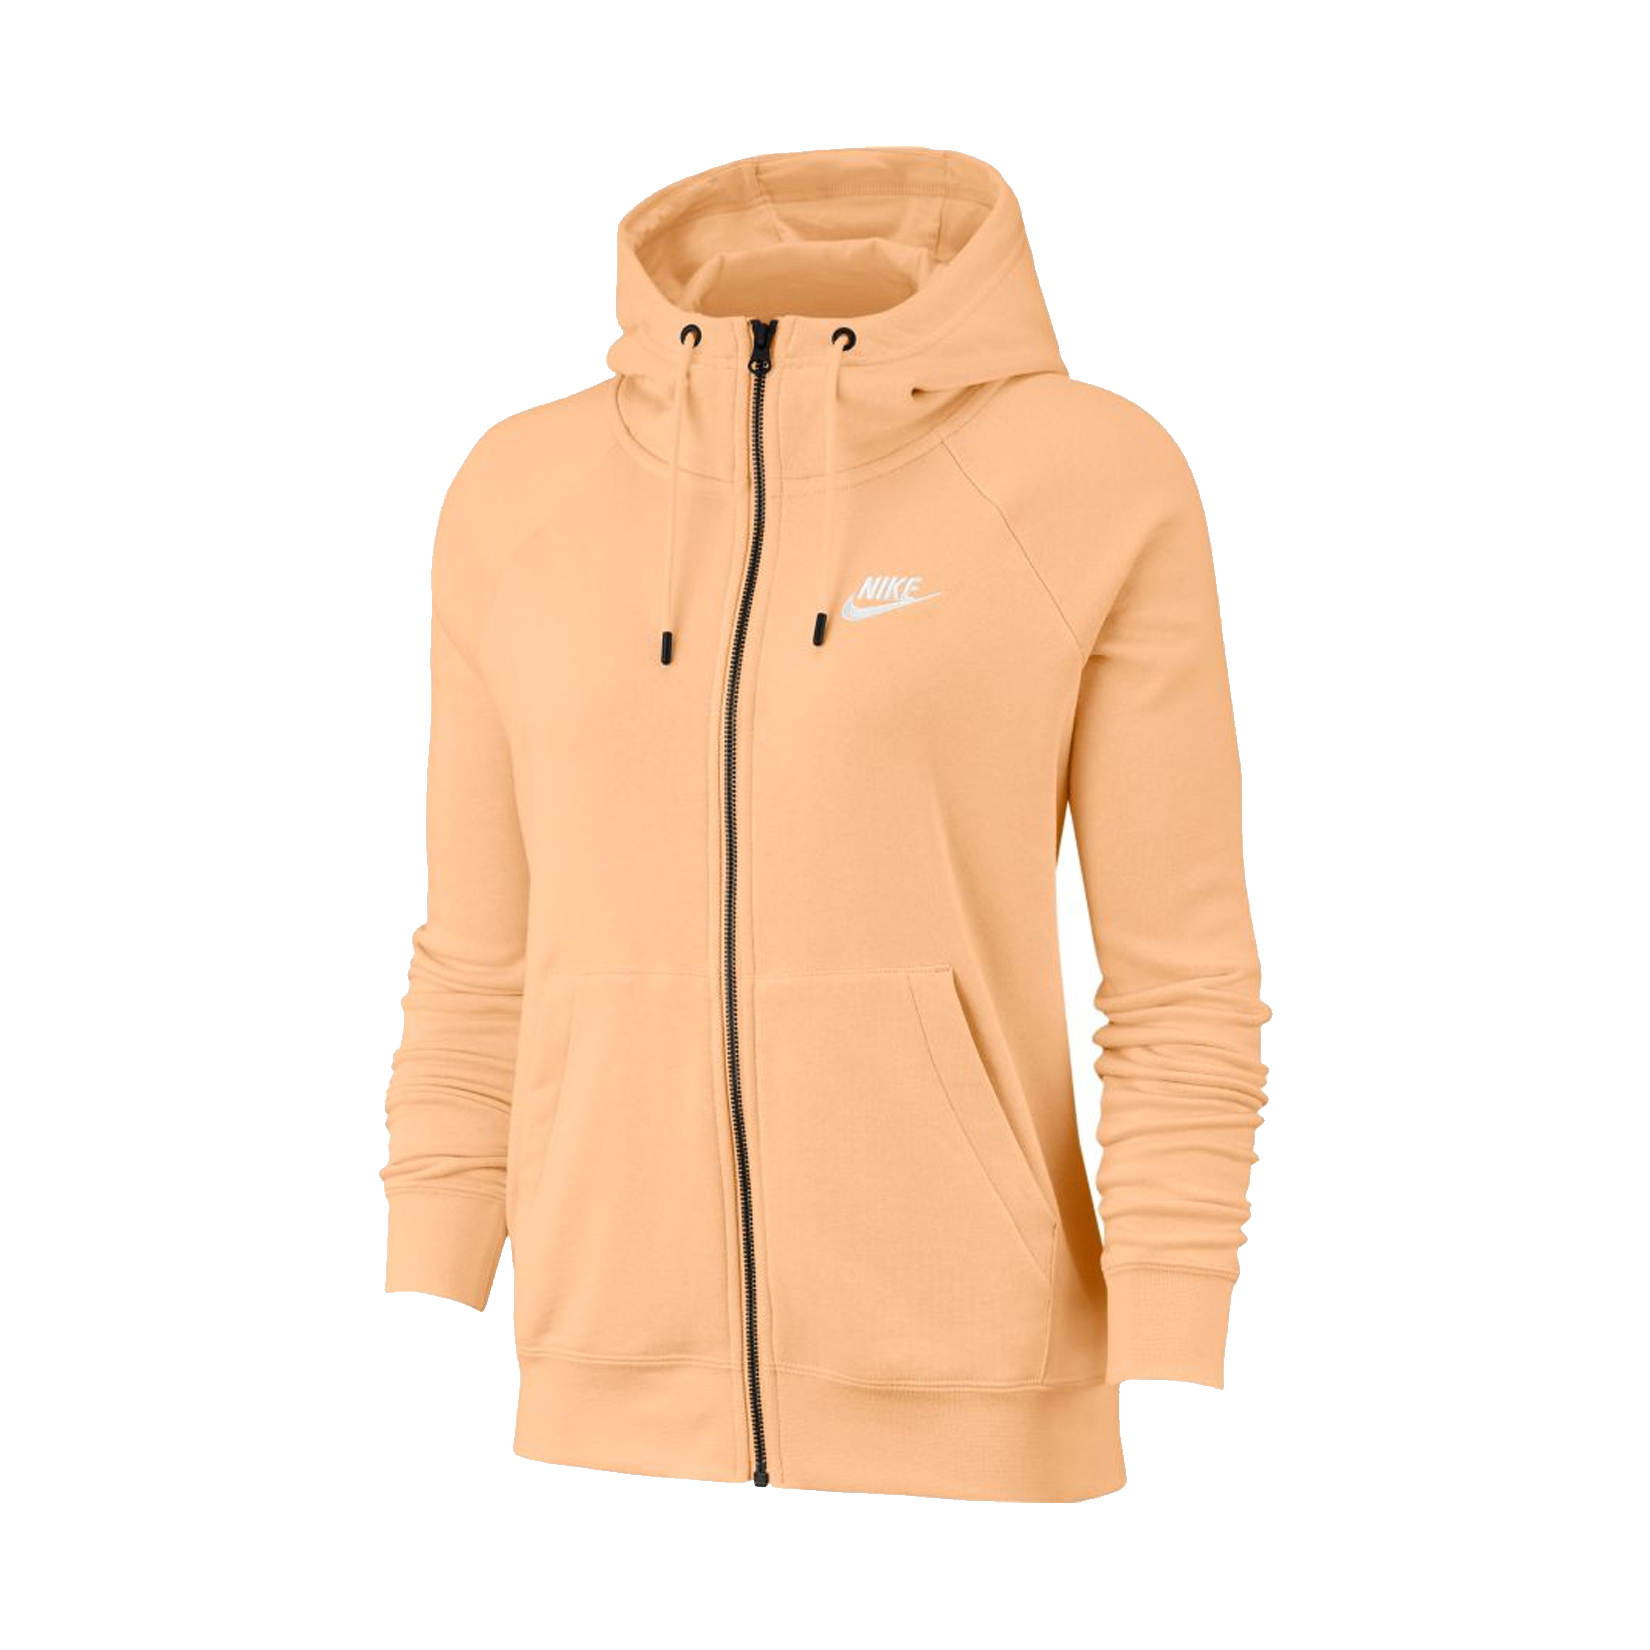 Nike Sportswear Essential Full-Zip Fleece Hoodie Peach